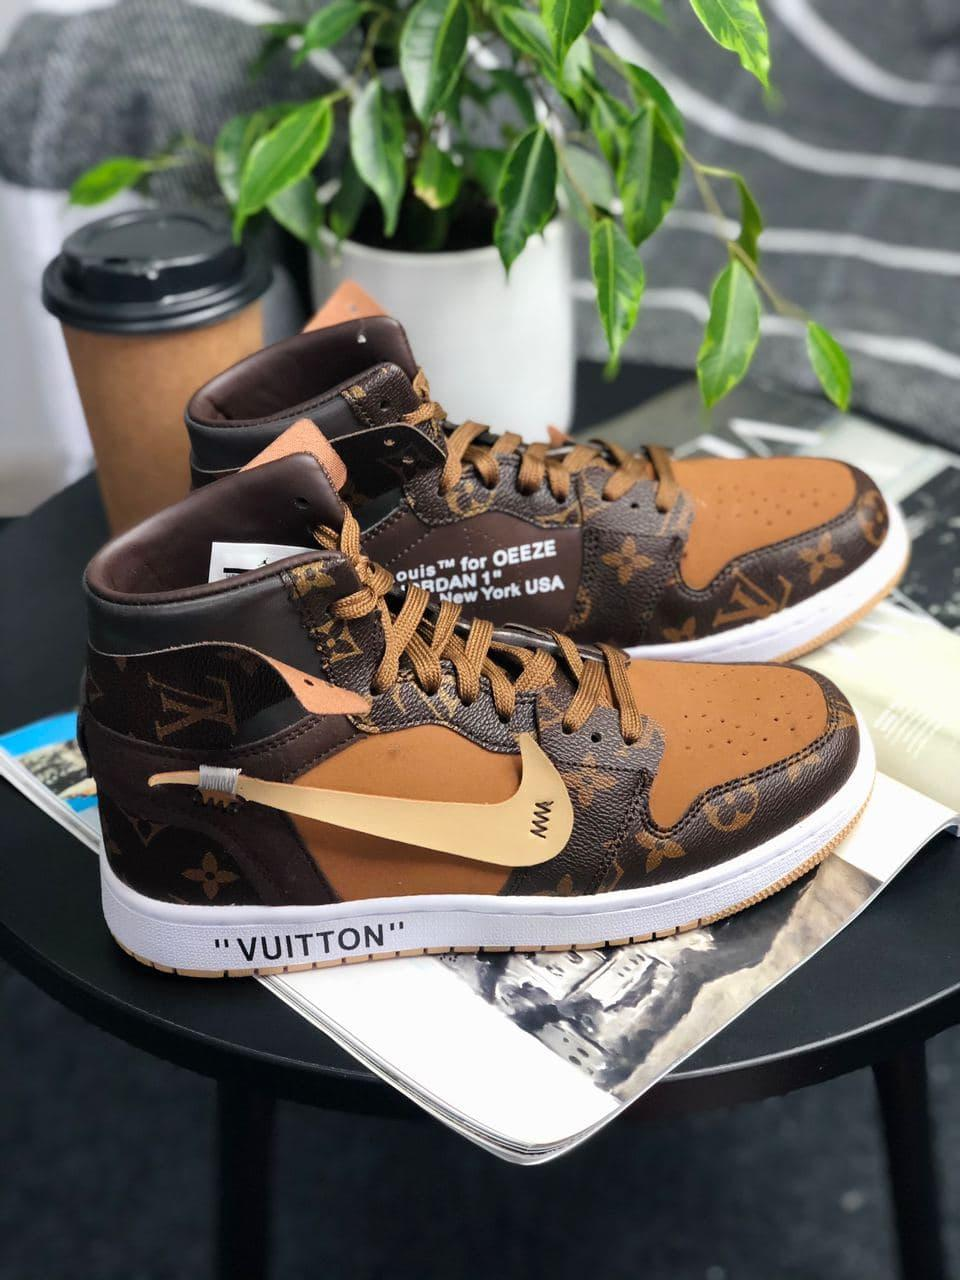 Кроссовки мужские  Air Jordan Retro High Louis Vuitton